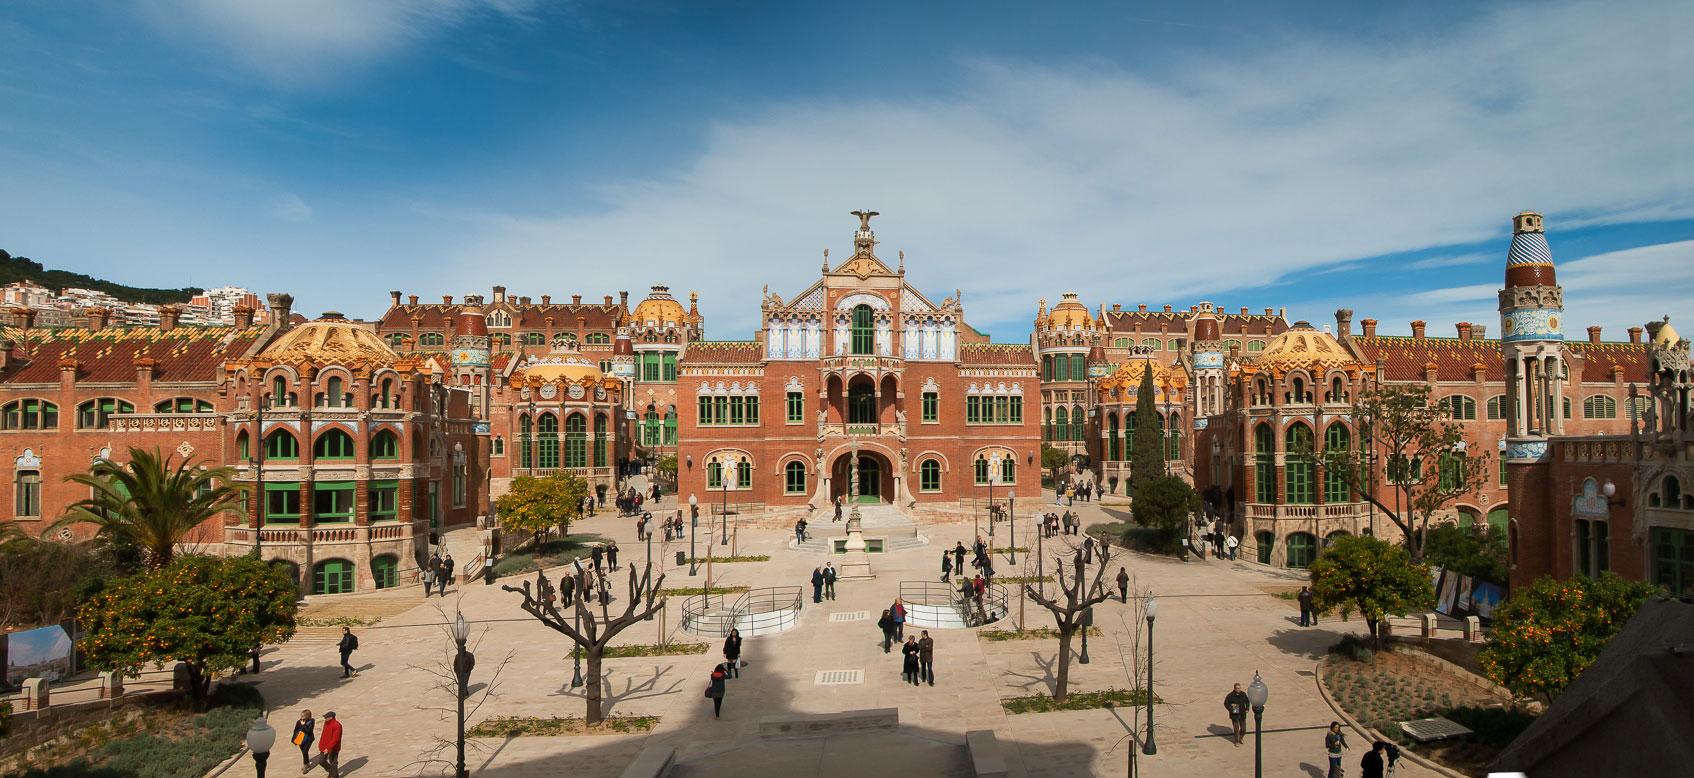 imagen destacada del texto sobre grandes nombres de la arquitectura catalana